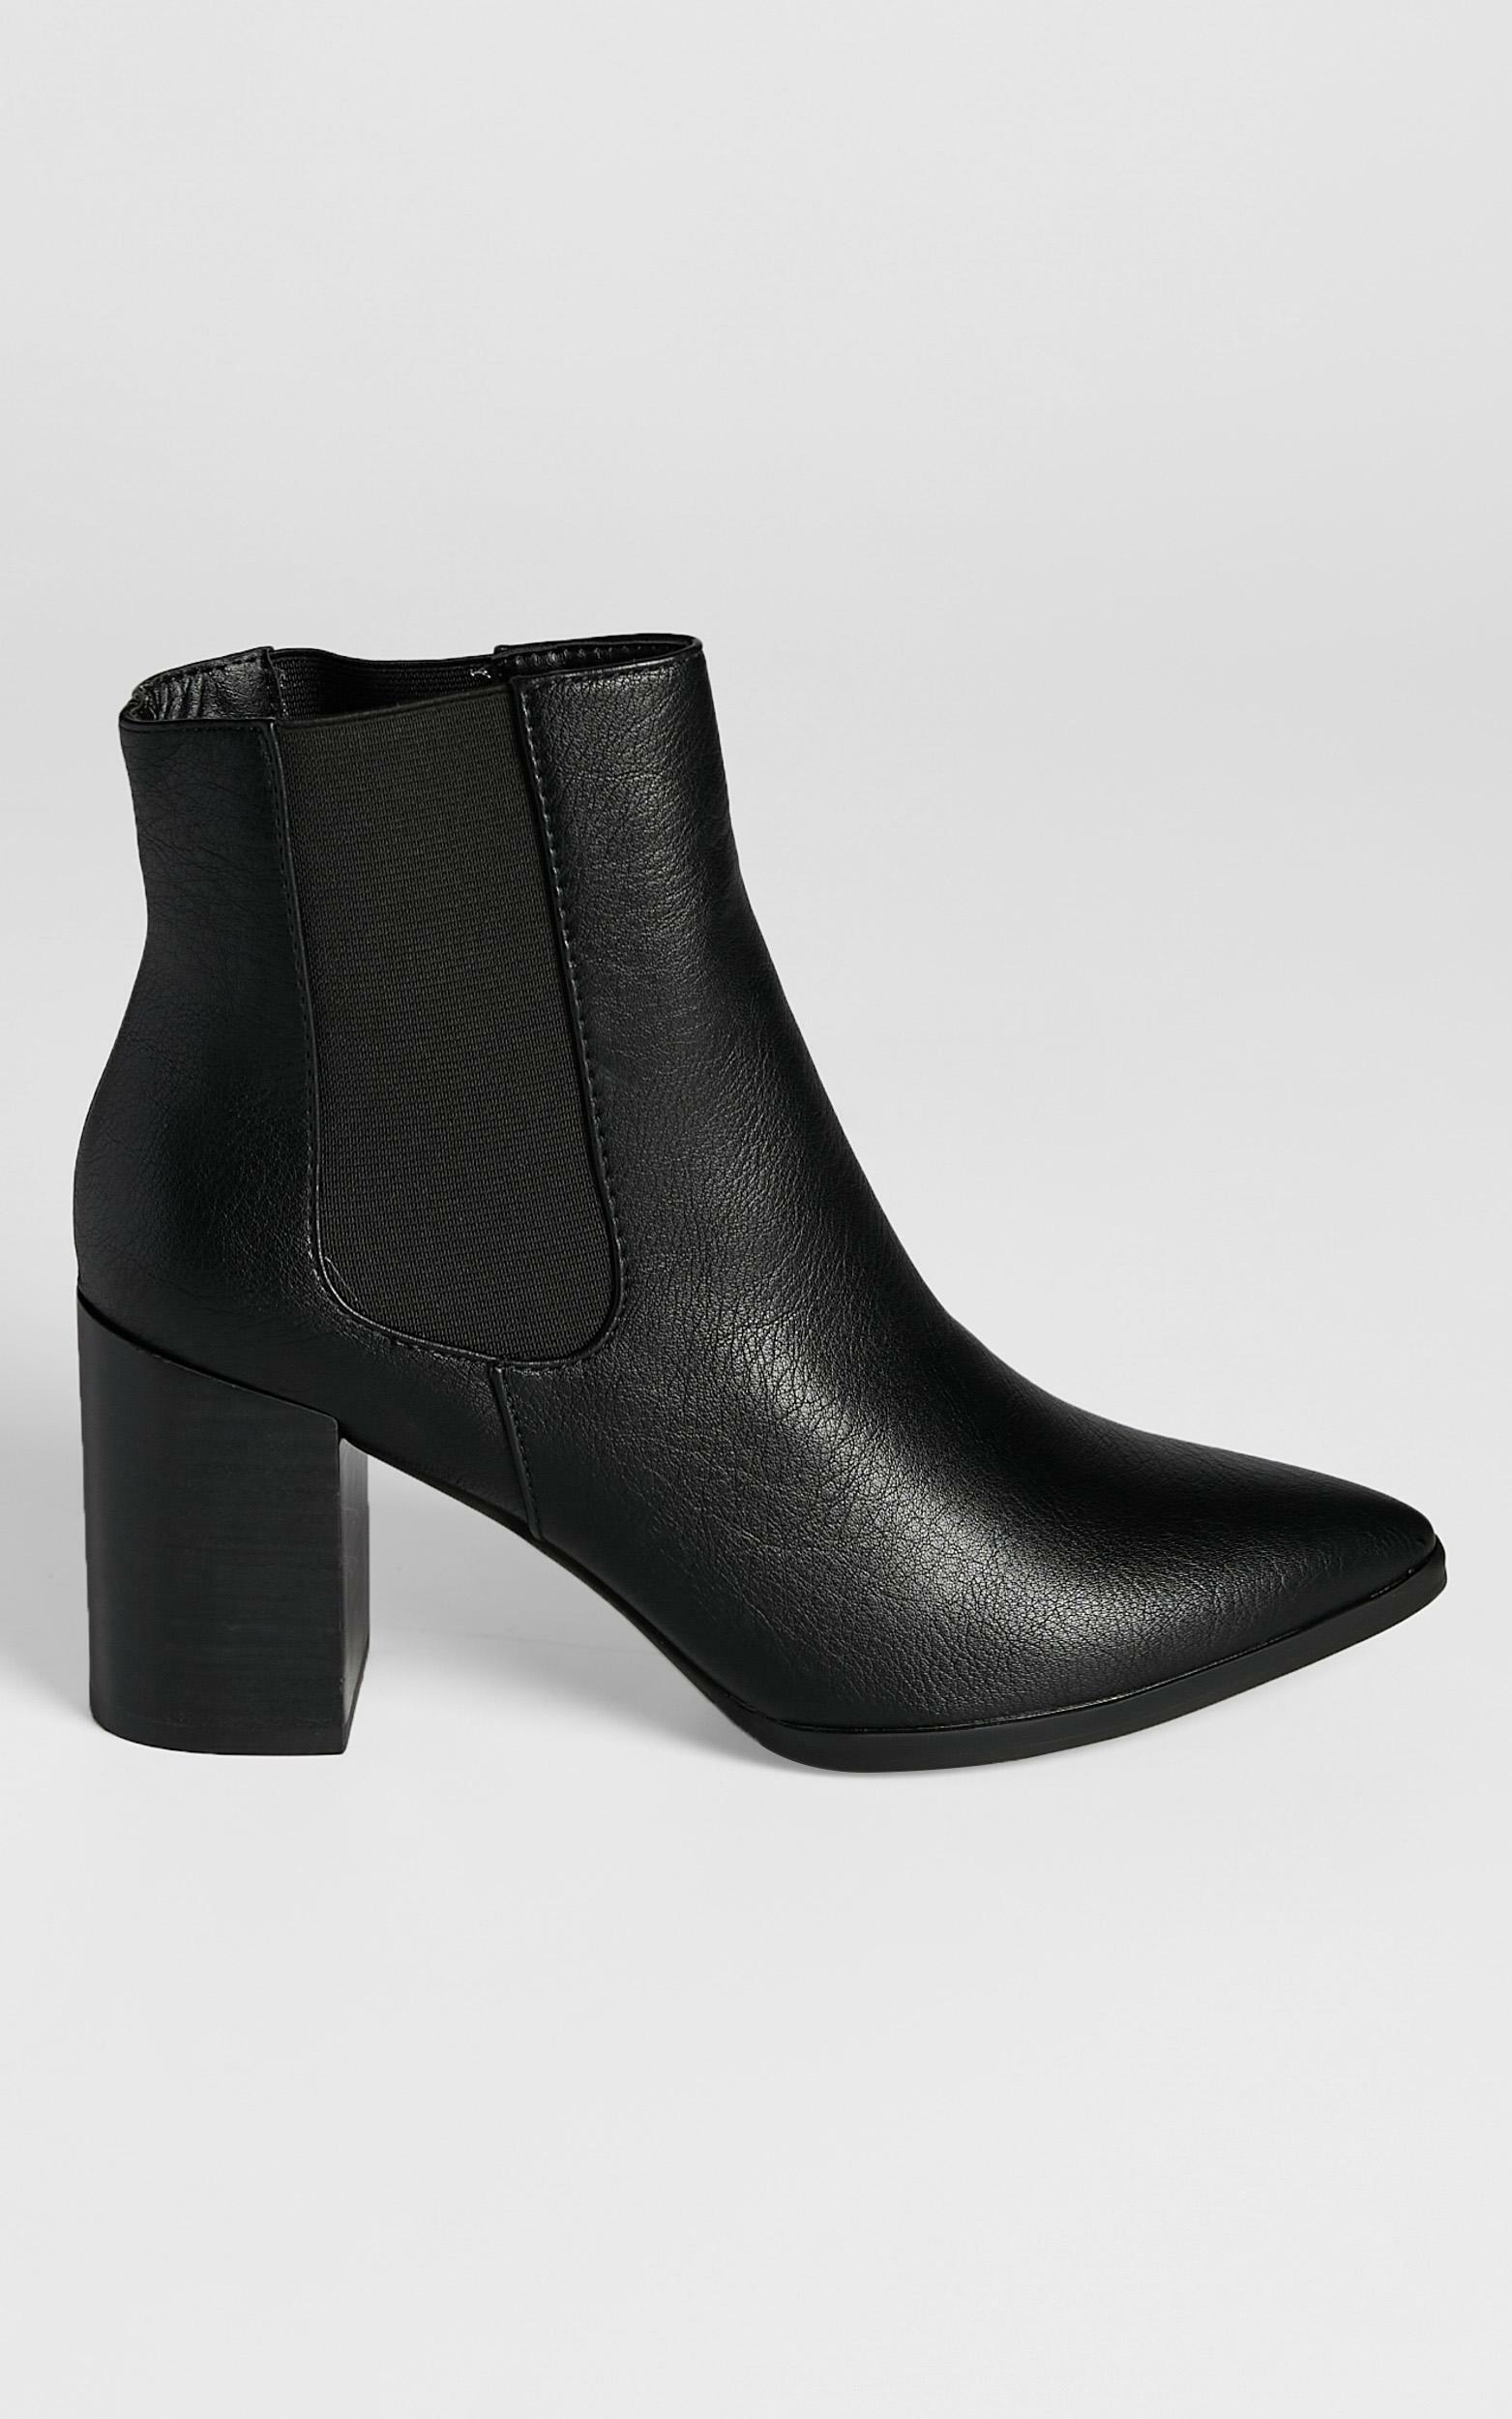 Billini - Arcadia Boots in Black - 5, BLK2, hi-res image number null